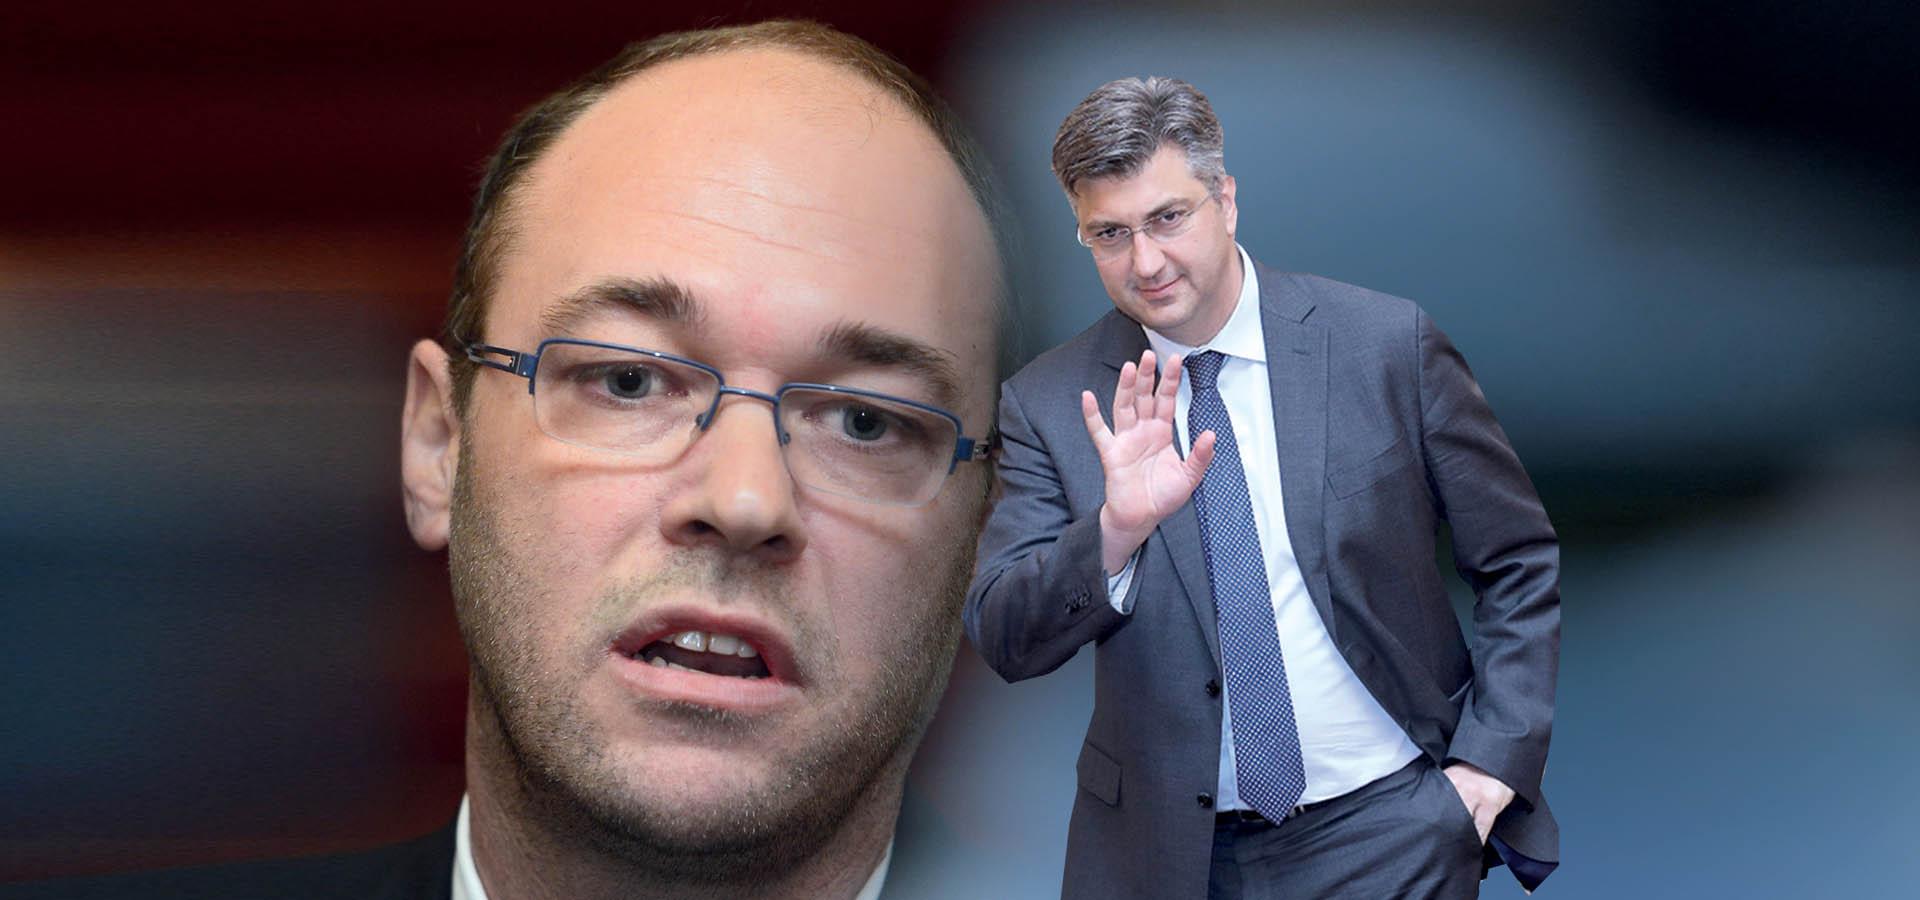 'STIER IZAZVAO PLENKOVIĆA, postaje lider oporbe unutar HDZ-a'